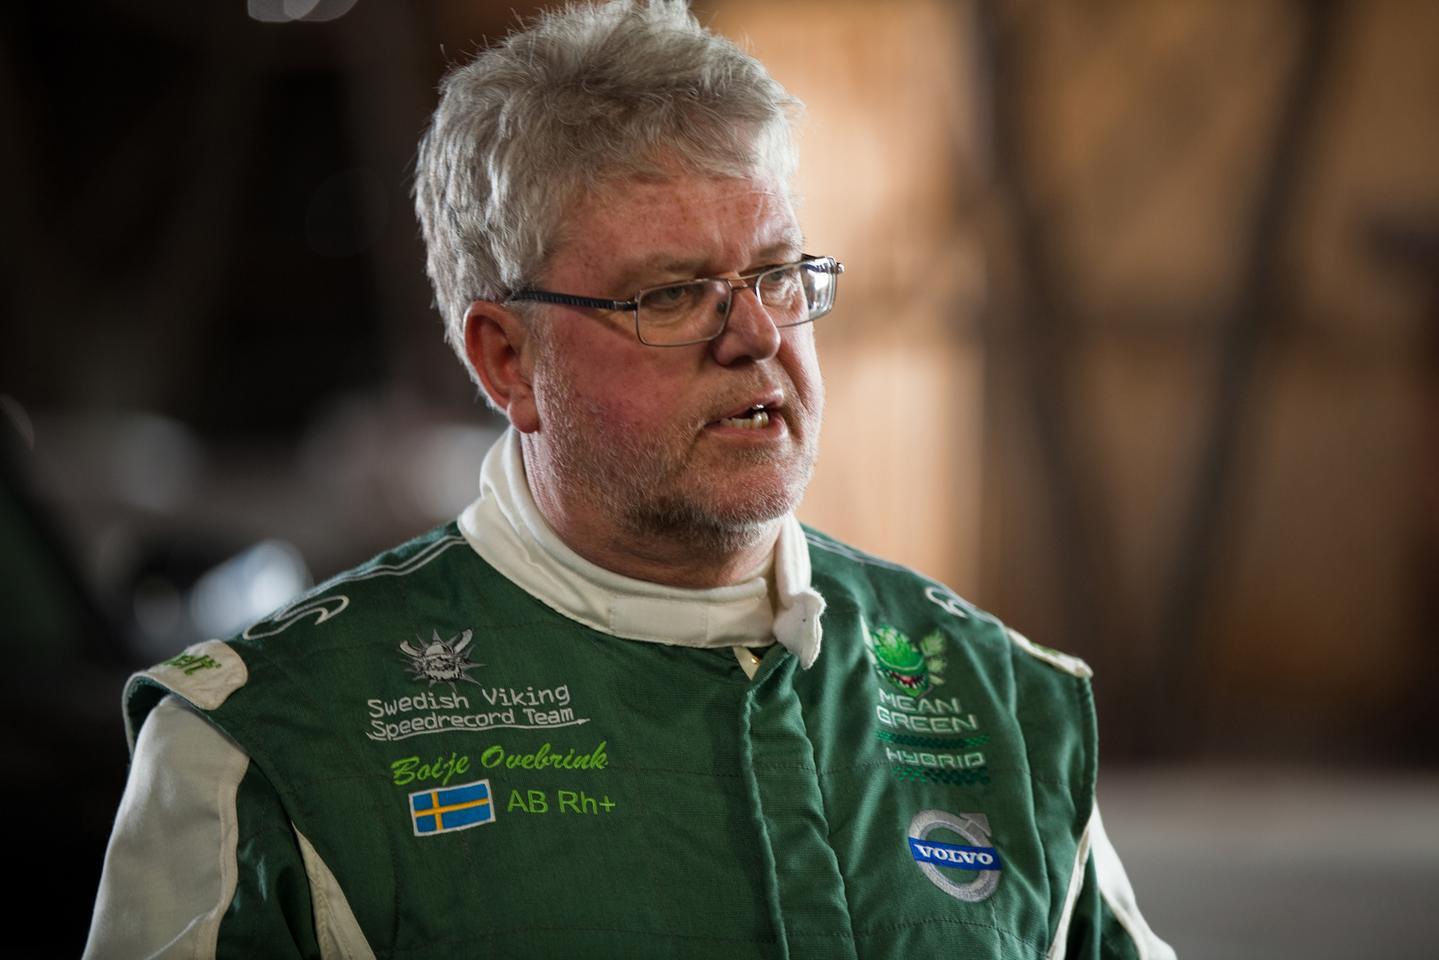 Boije Ovebrink 'Mean Green's driver and owner